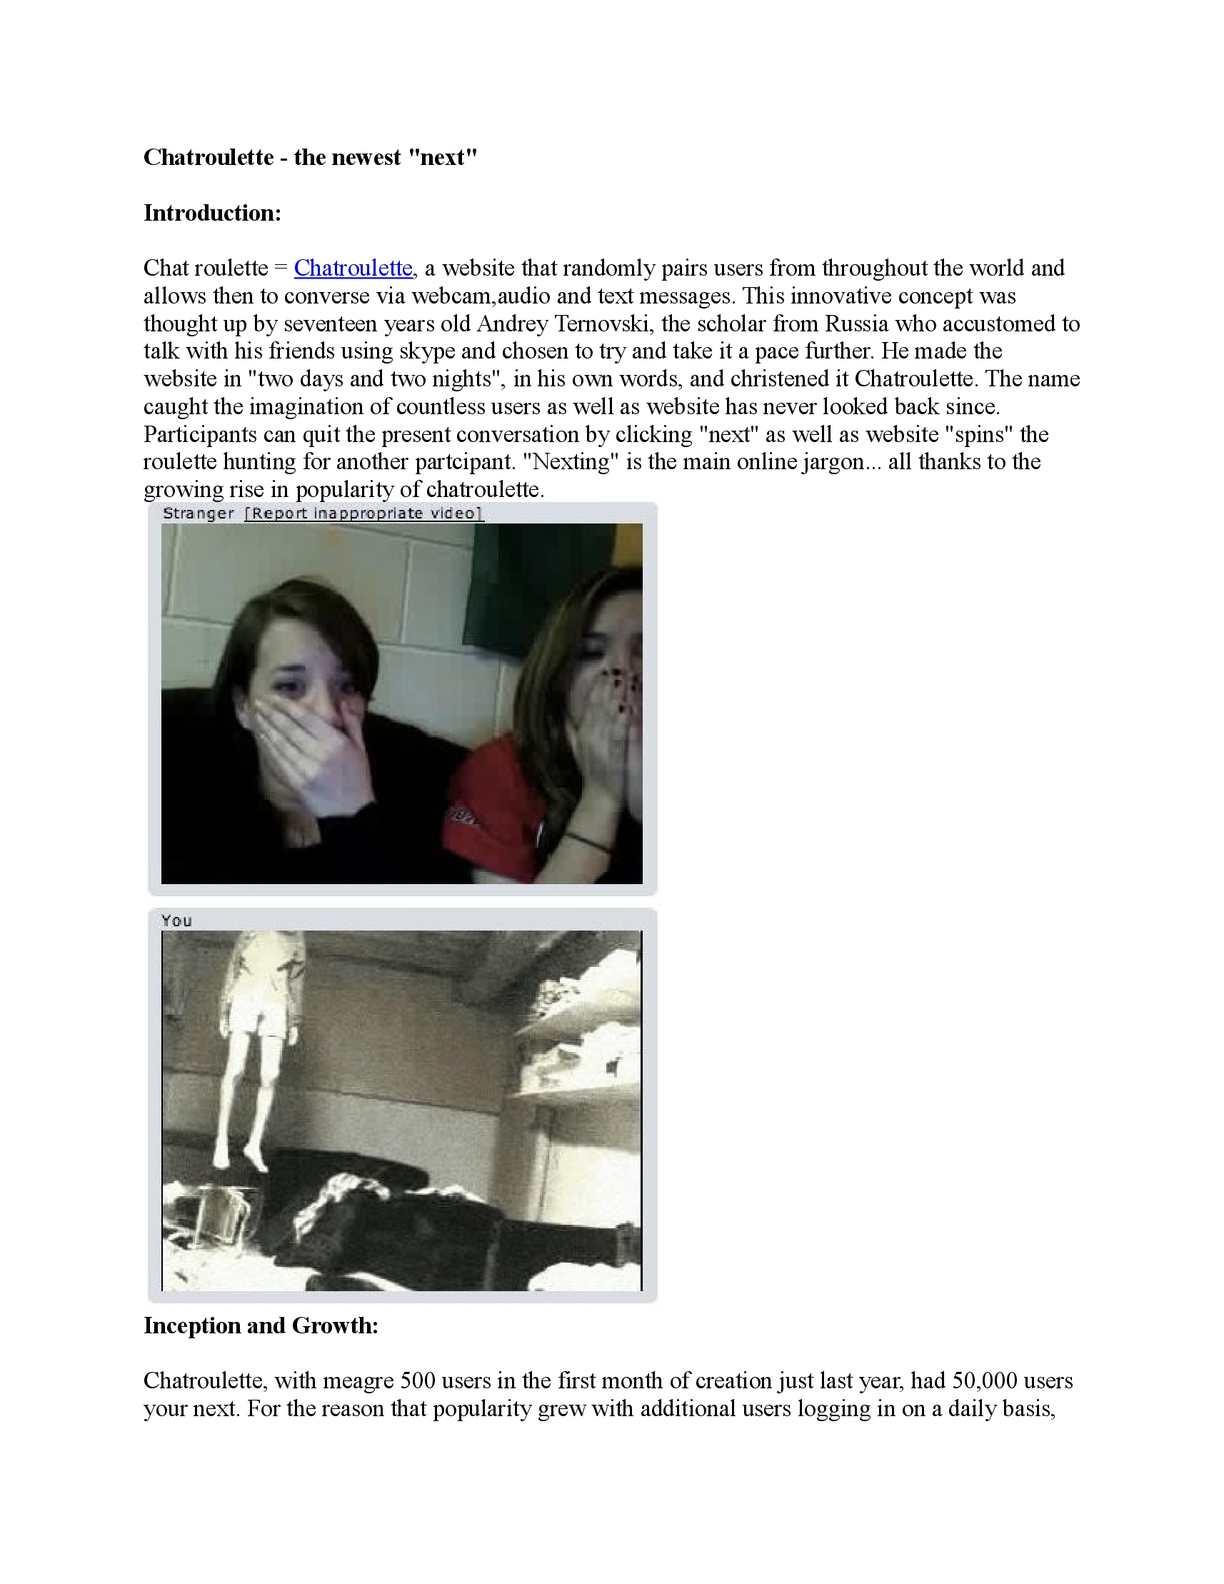 Webcam chat like chatroulette